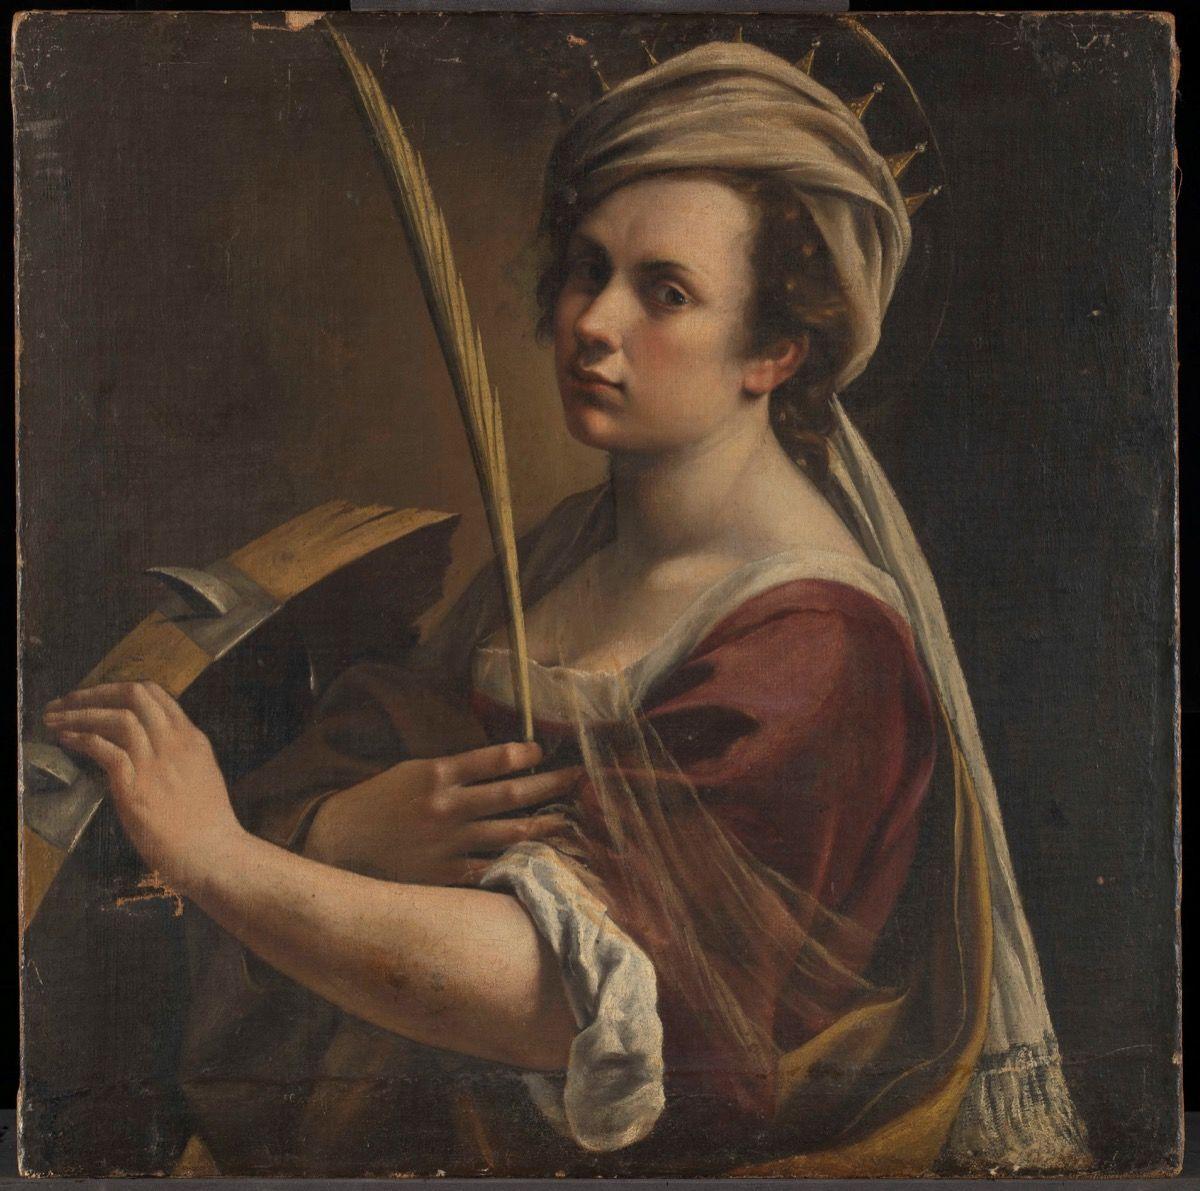 Artemisia Gentileschi, Self Portrait as Saint Catherine of Alexandria, about 1615–17. © The National Gallery, London. Courtesy of The National Gallery, London.